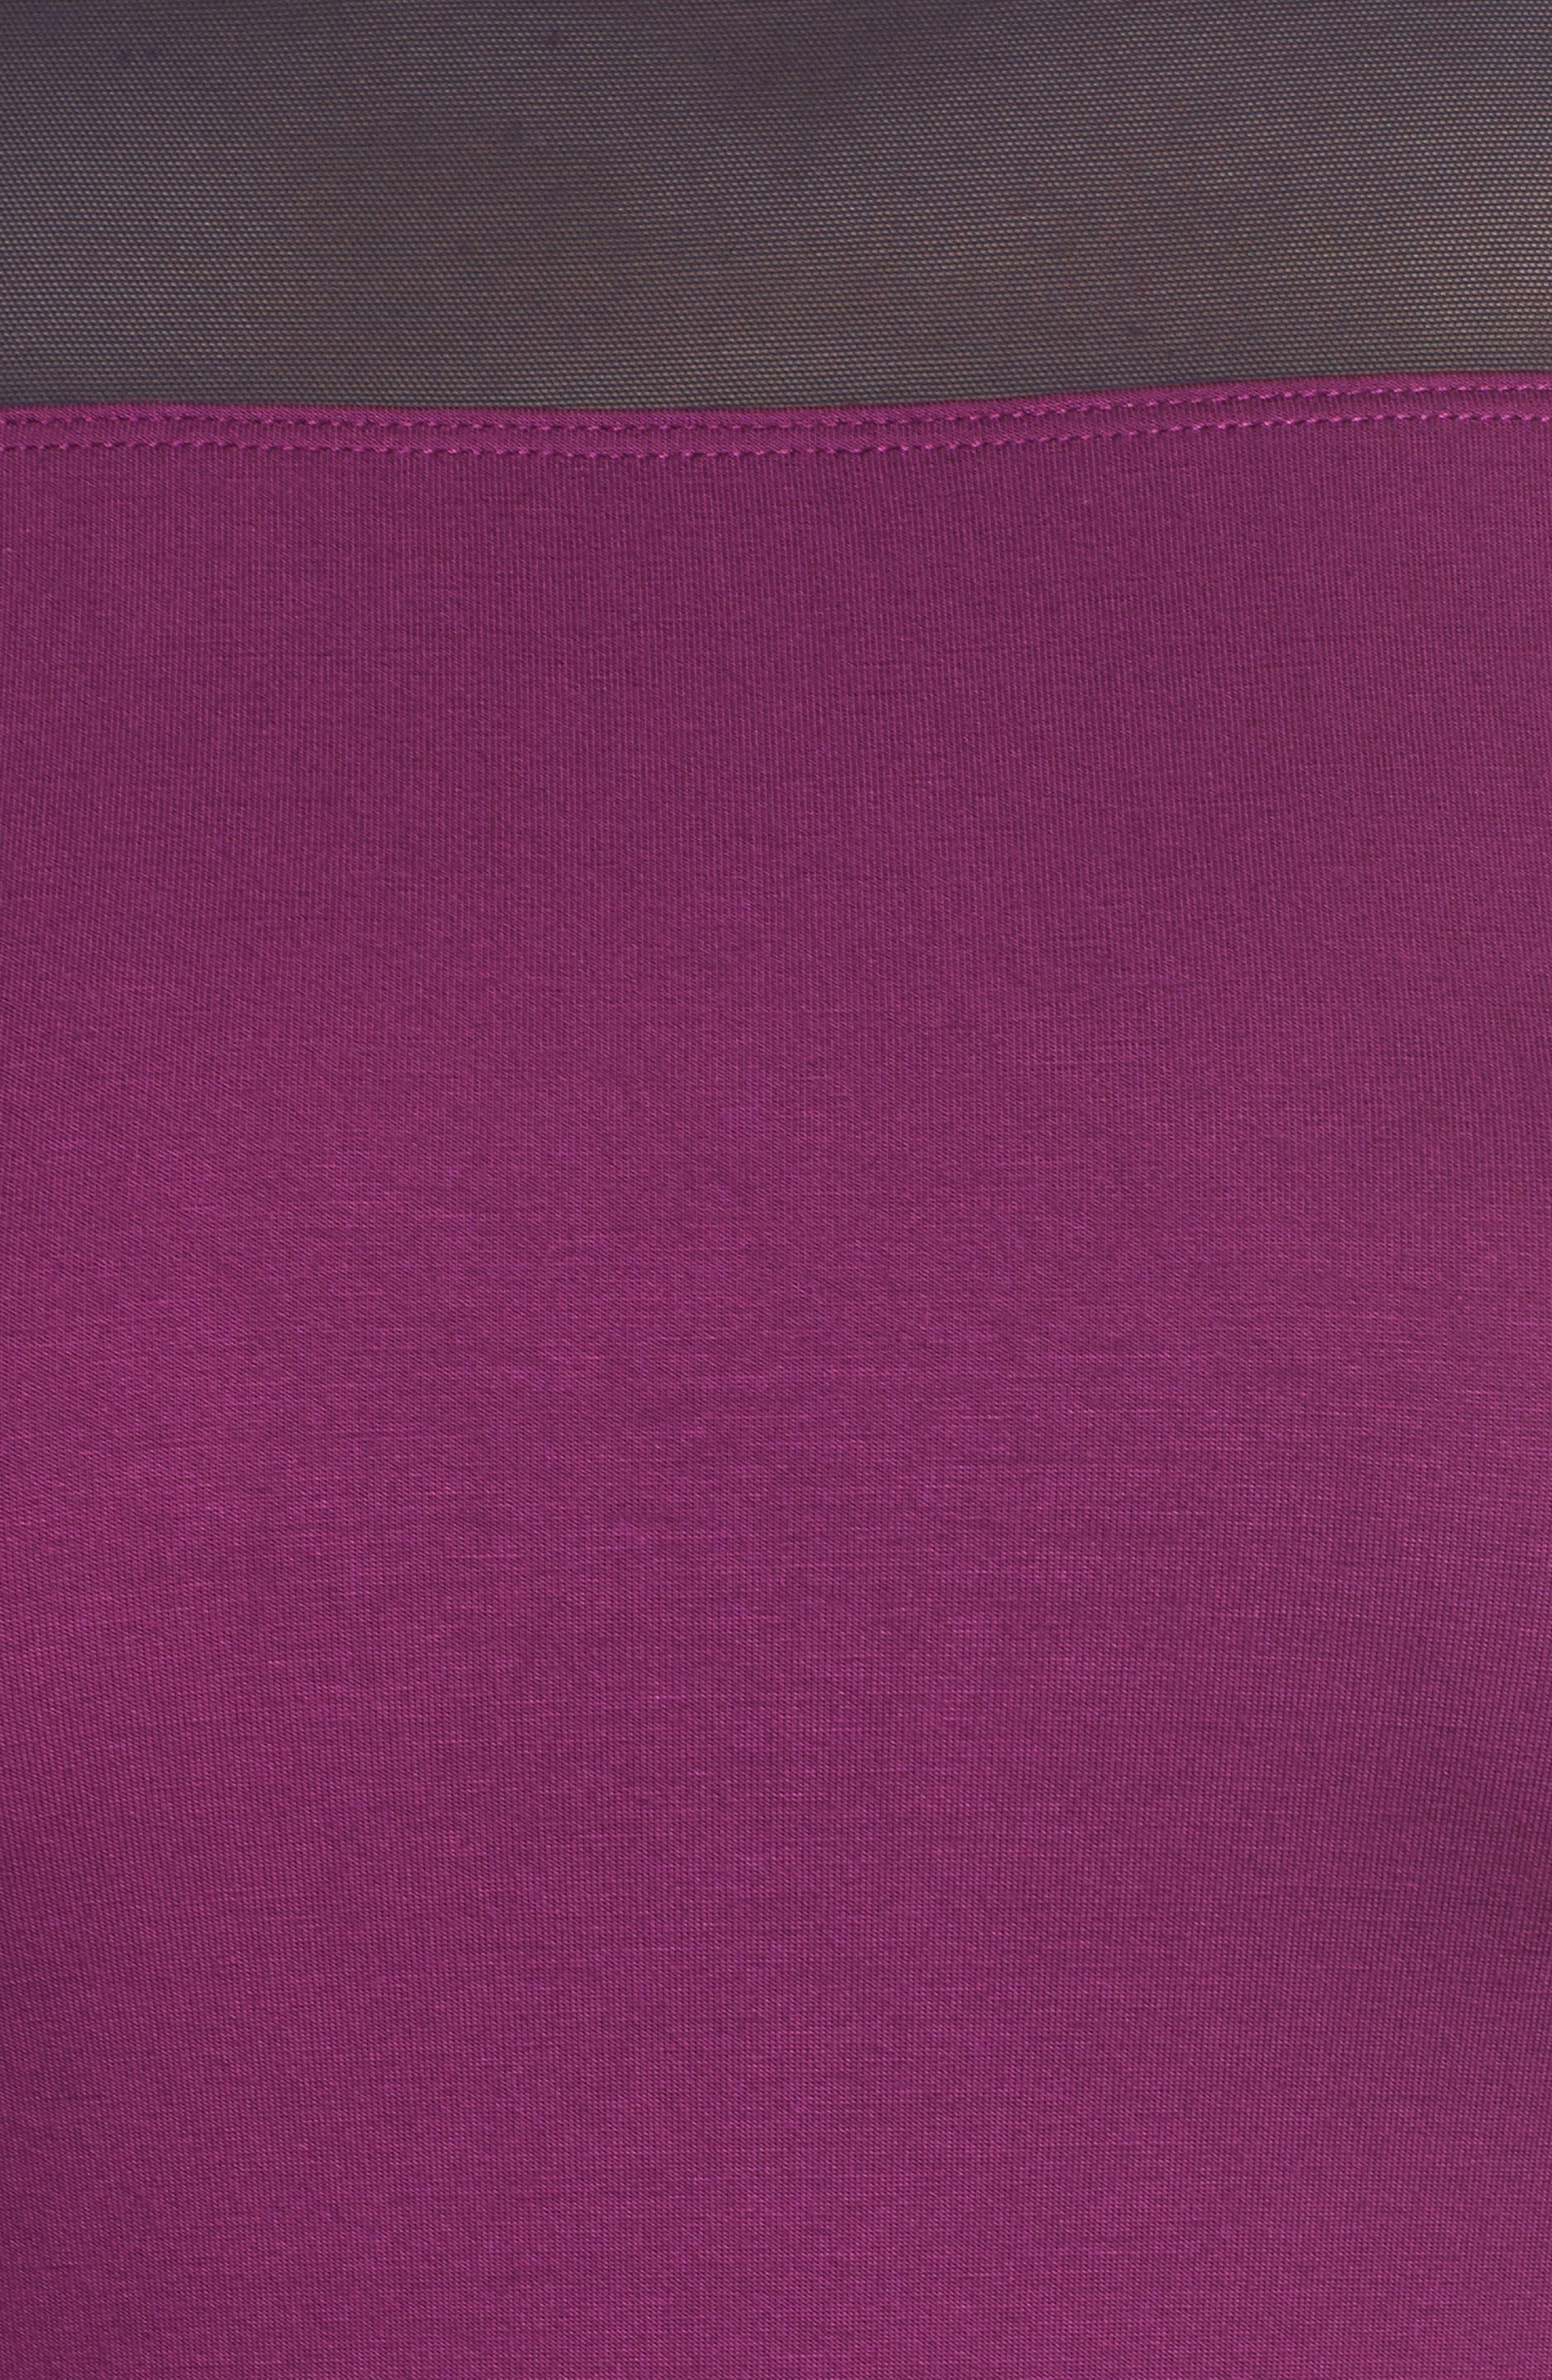 Short Sleeve Tee,                             Alternate thumbnail 5, color,                             Plum/ Navy